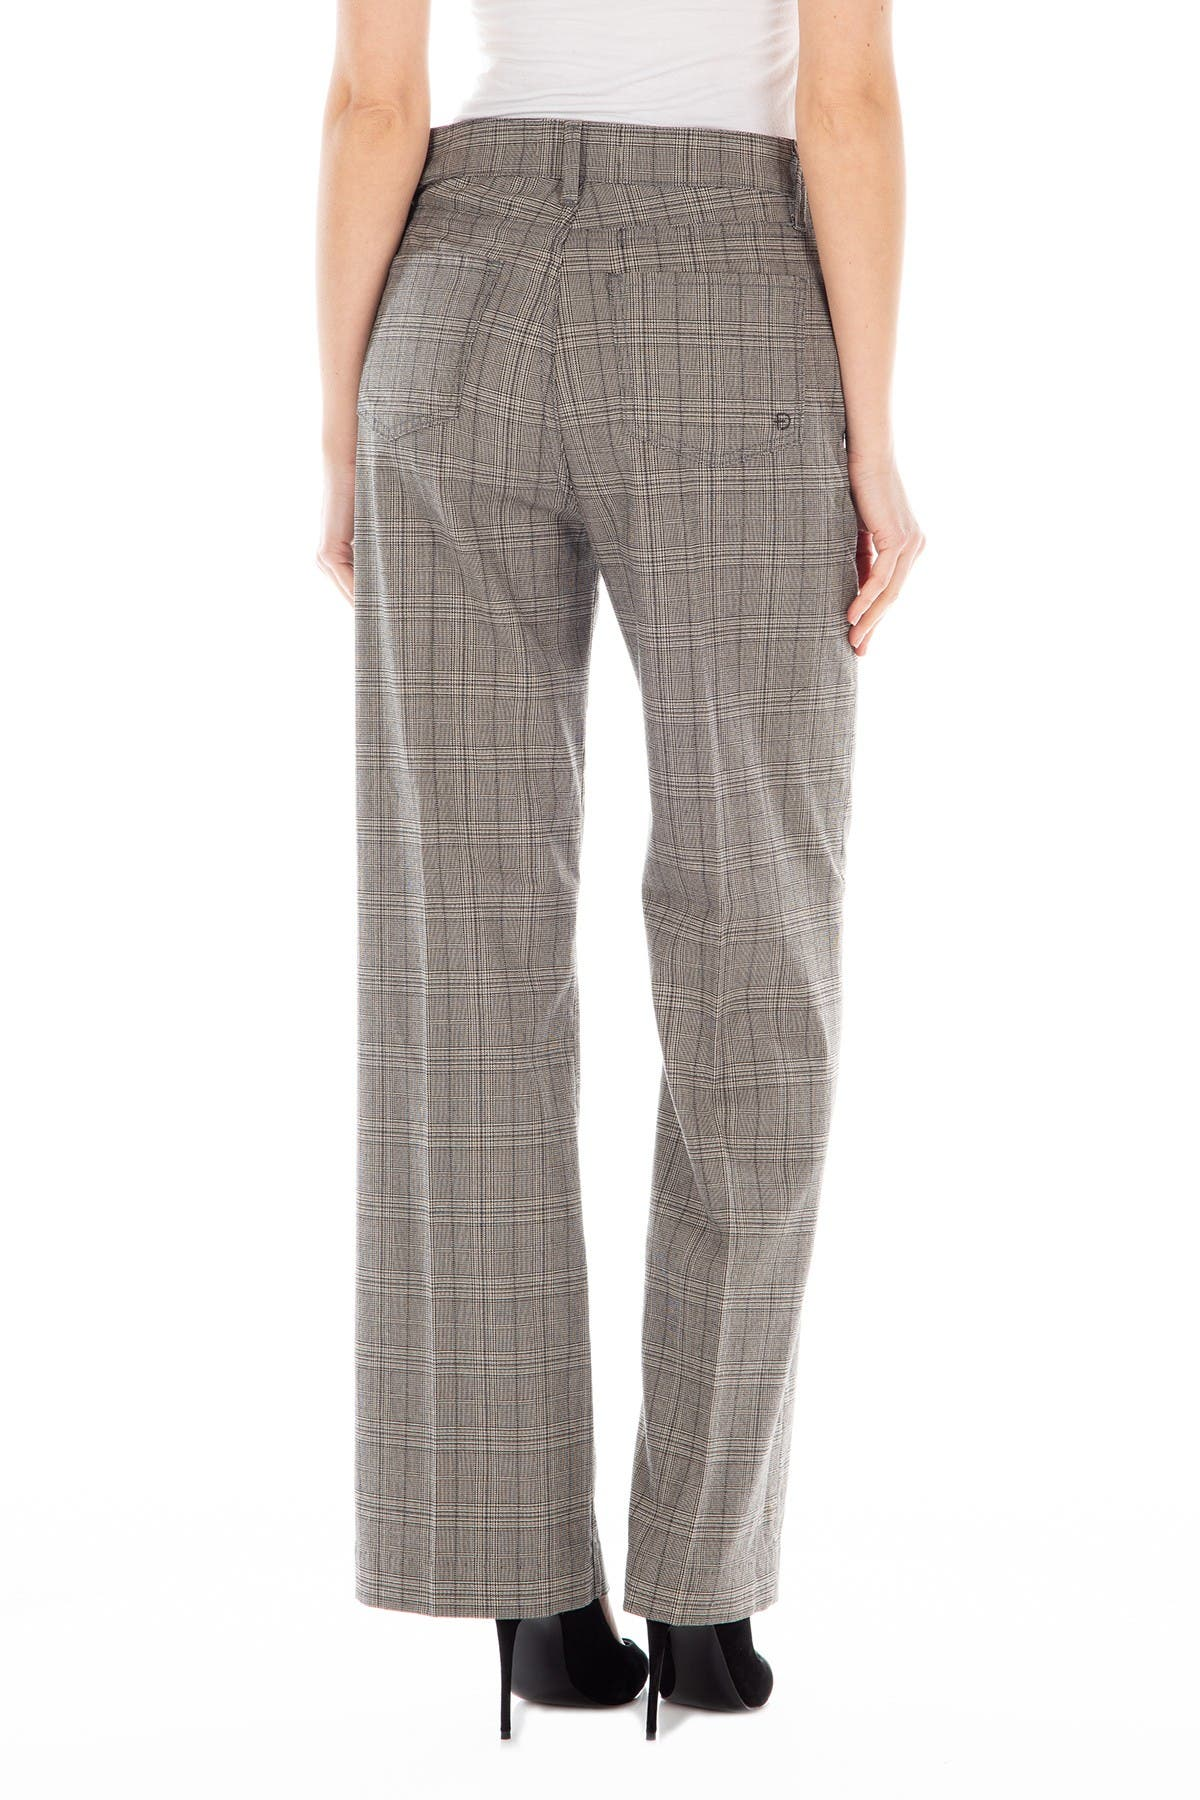 Image of FIDELITY DENIM Sunday High Rise Wide Leg Plaid Pants